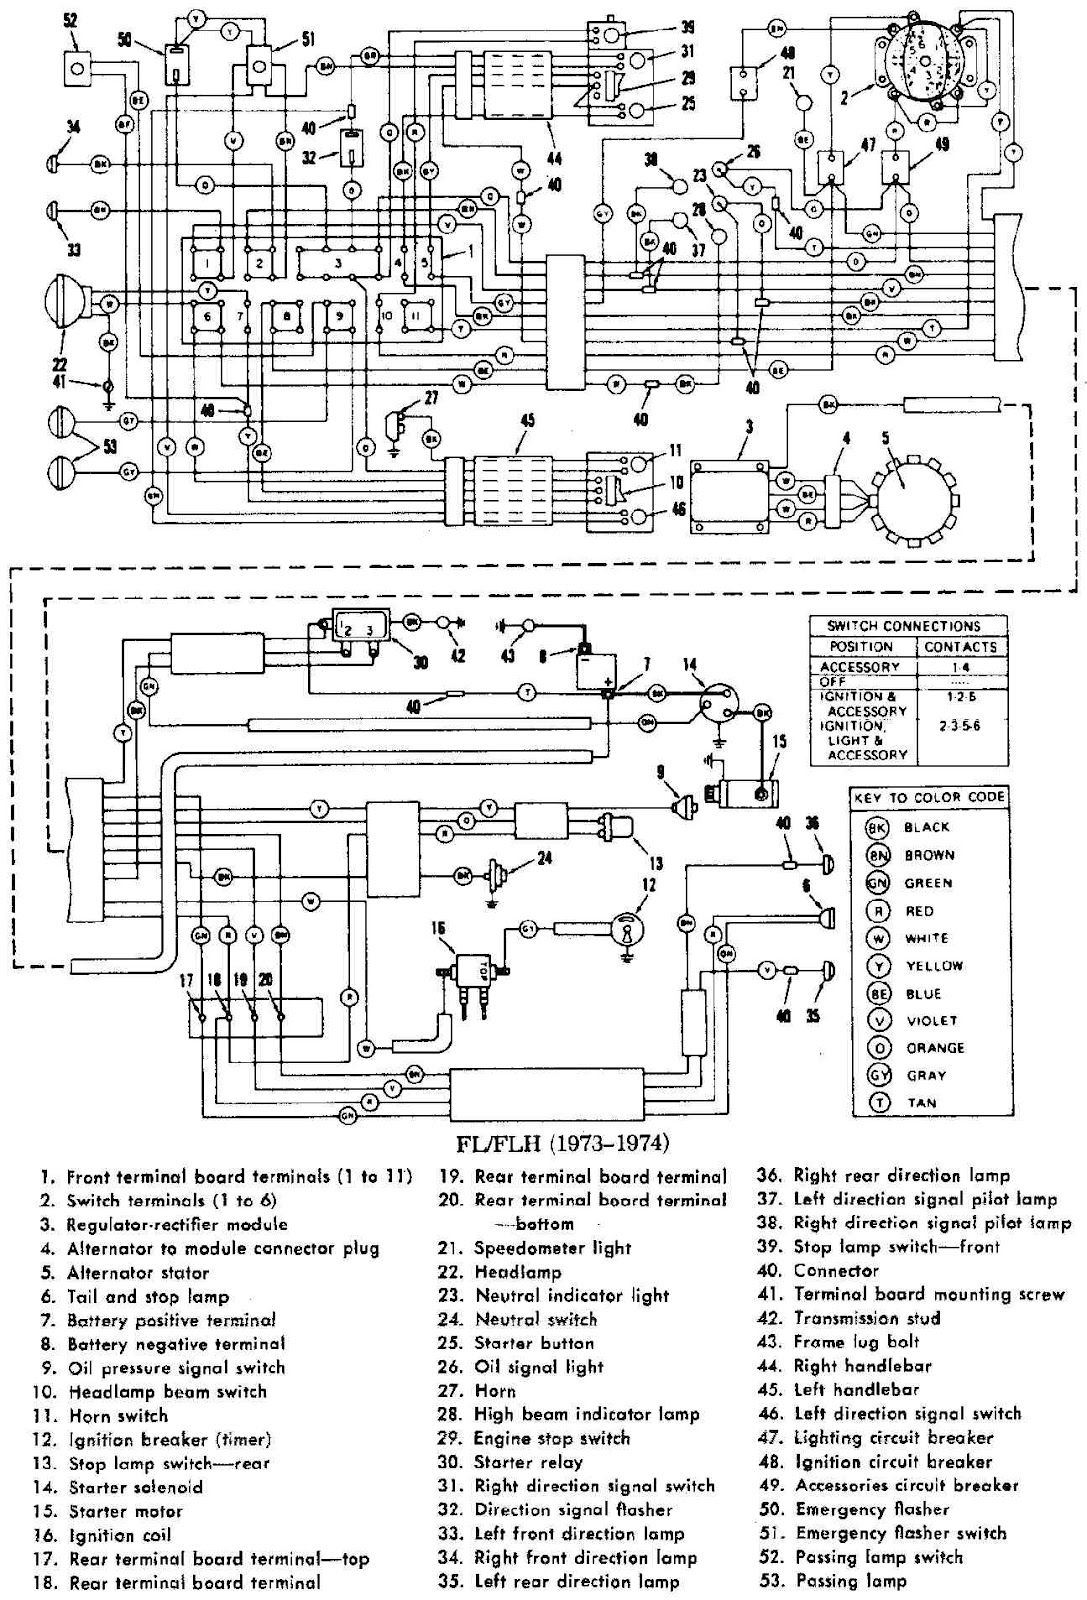 Harley Davidson Softail Slim Wiring Diagram | Wiring Library